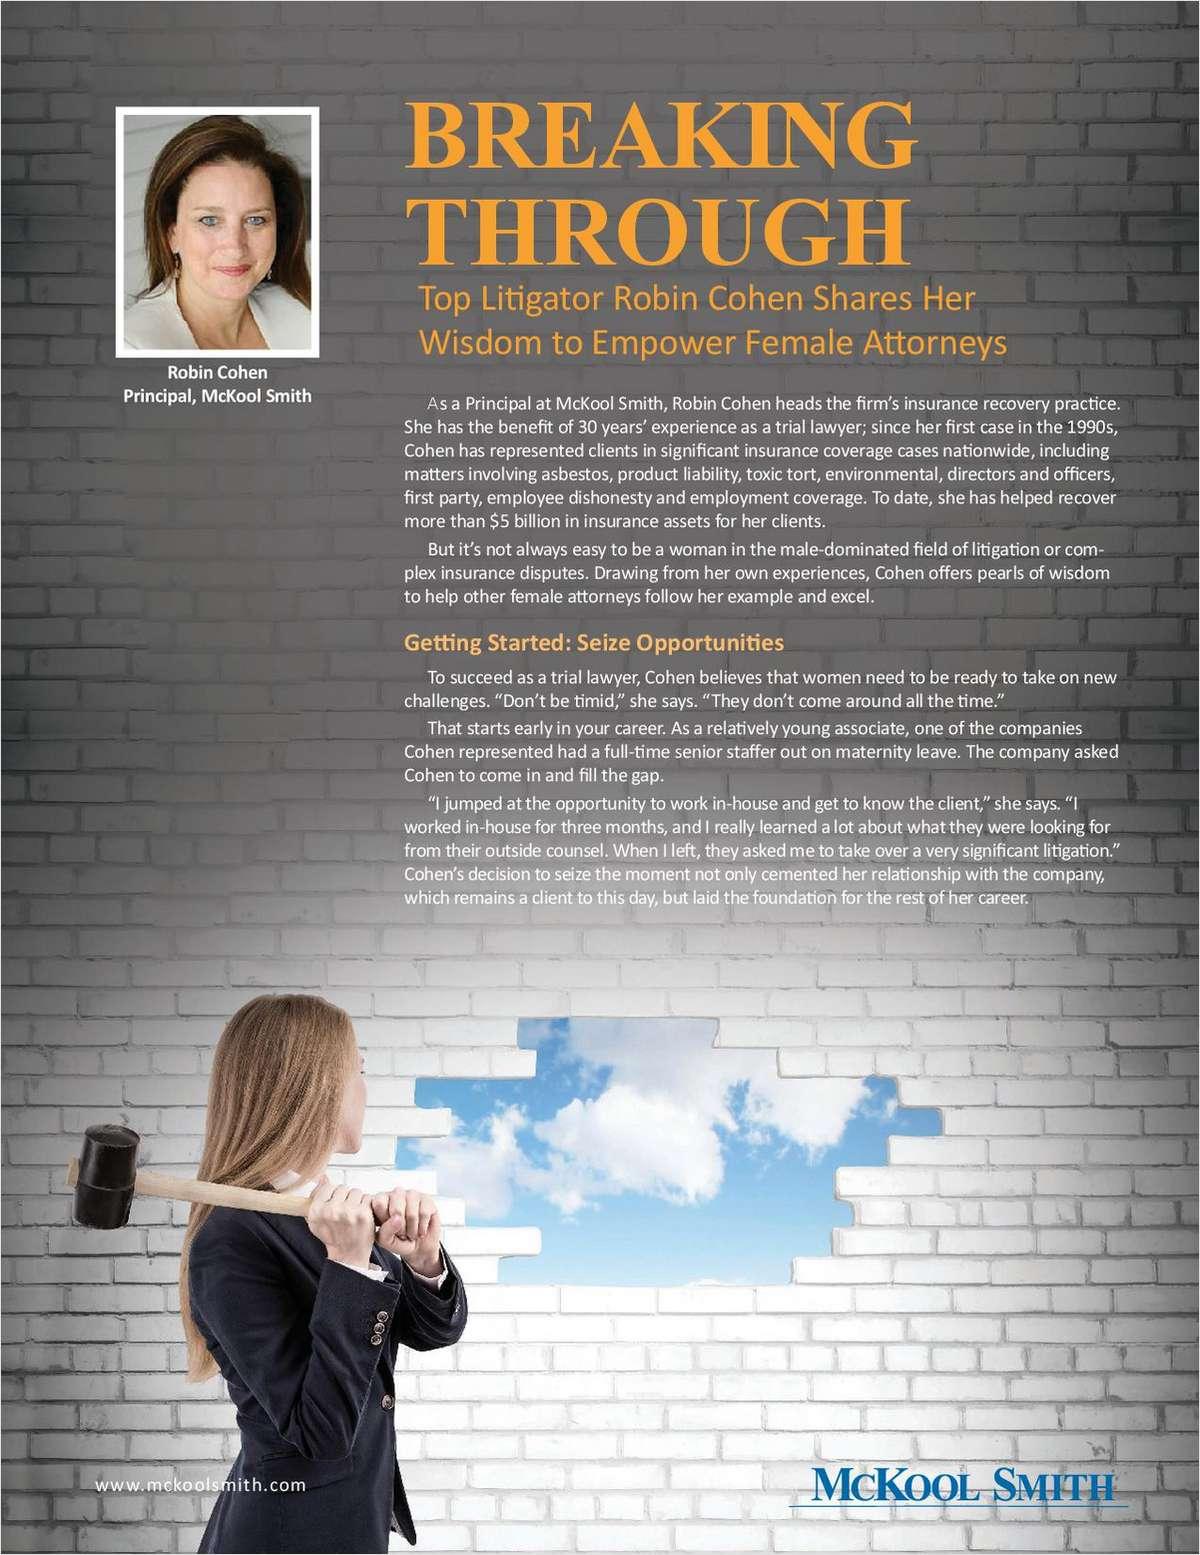 Breaking Through: Top Litigator Robin Cohen Shares Her Wisdom to Empower Female Attorneys